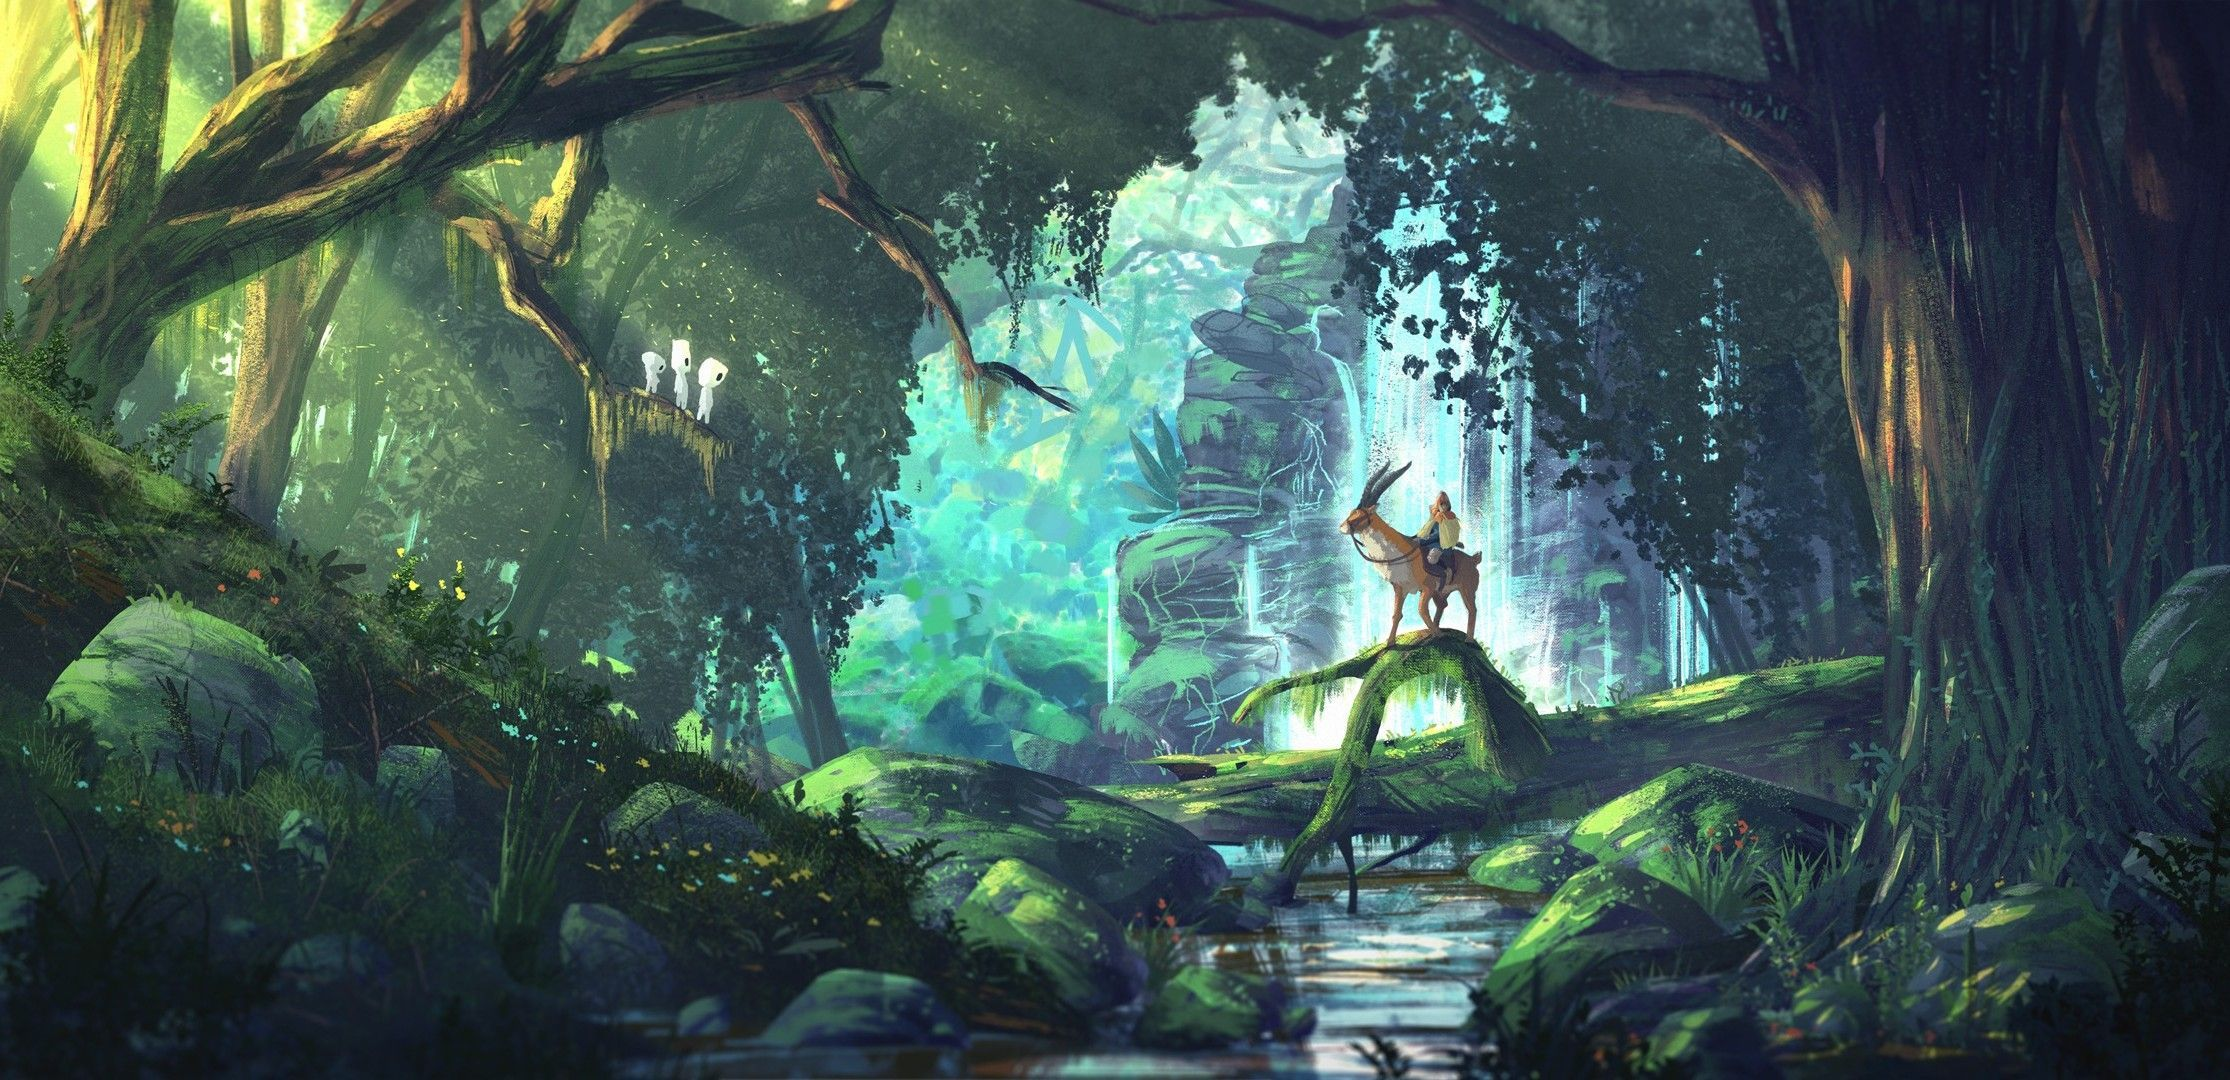 Princess Mononoke Studio Ghibli Wallpapers - Top Free ...